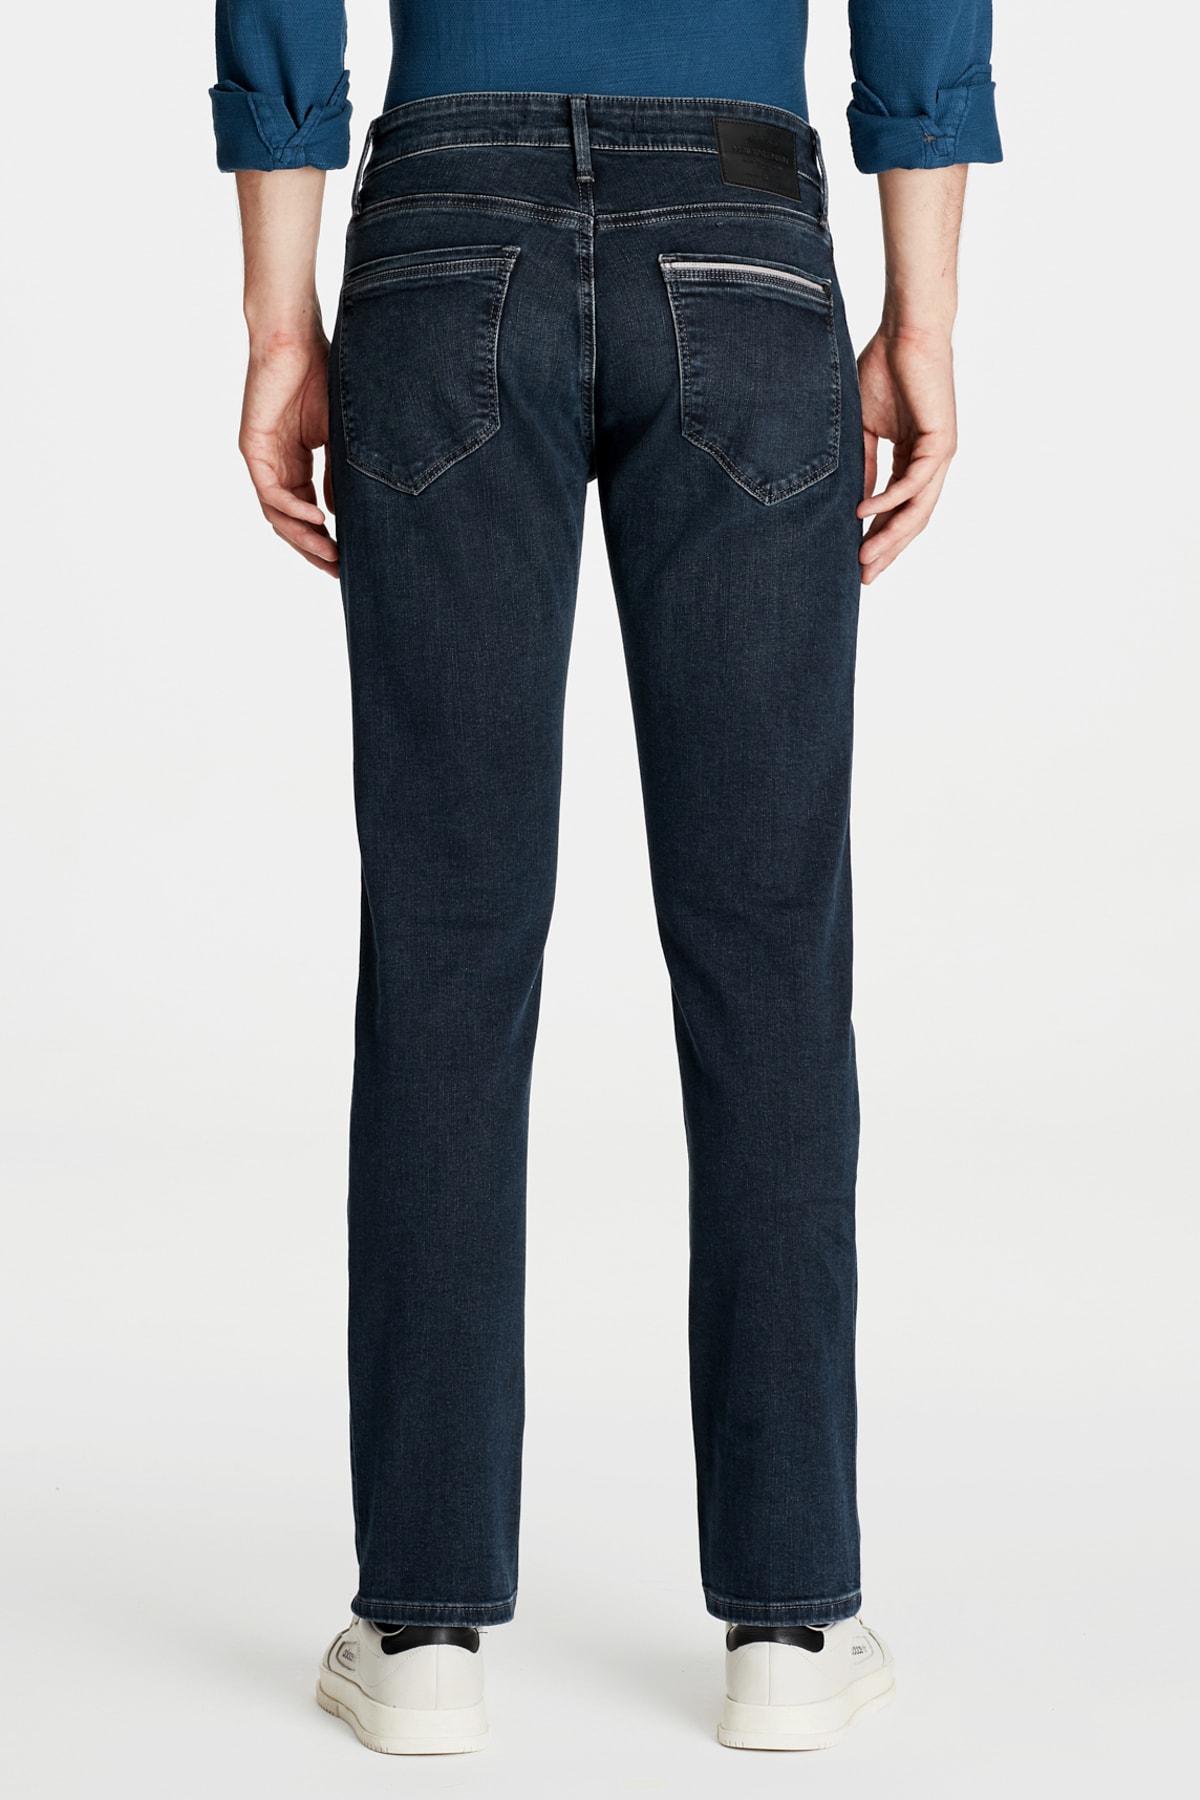 Mavi Erkek Martin  Premium Jean Pantolon 0037828211